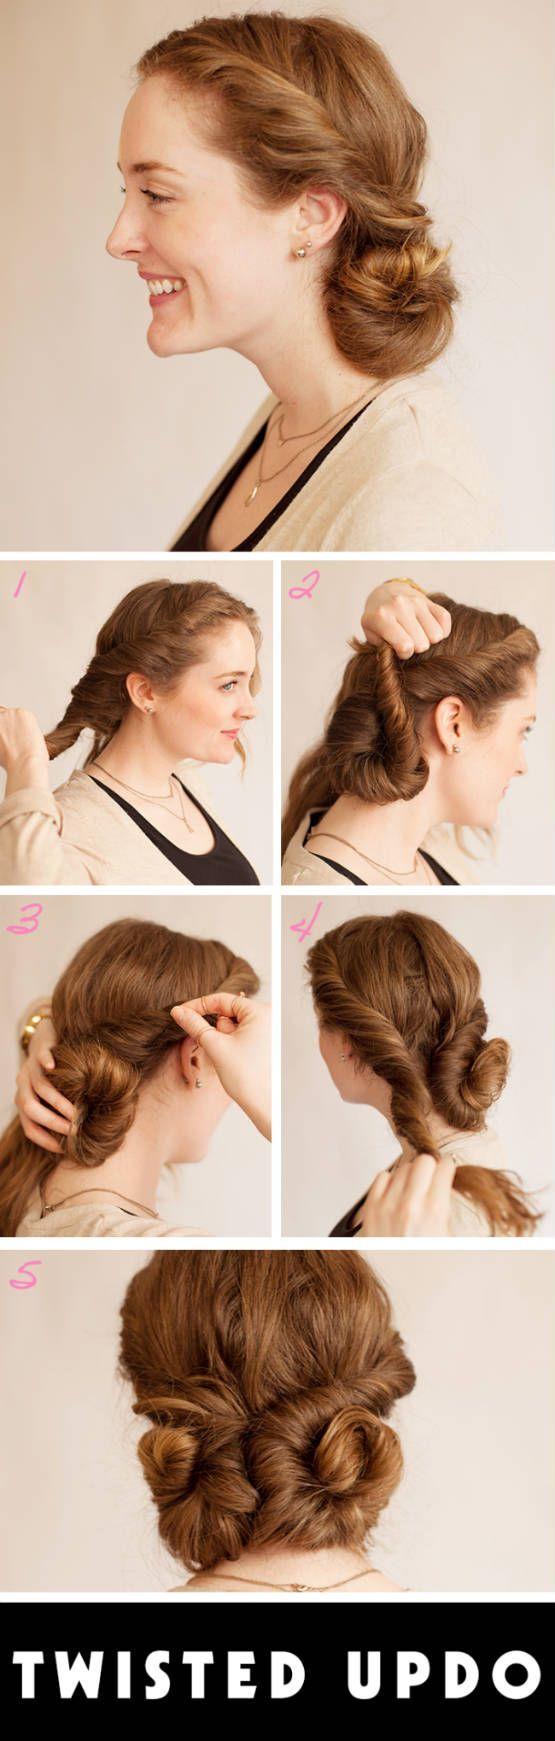 Elegant Hairstyle with Vintage Hair Updo Tutorial | Long hair updo, Vintage hairstyles for long hair